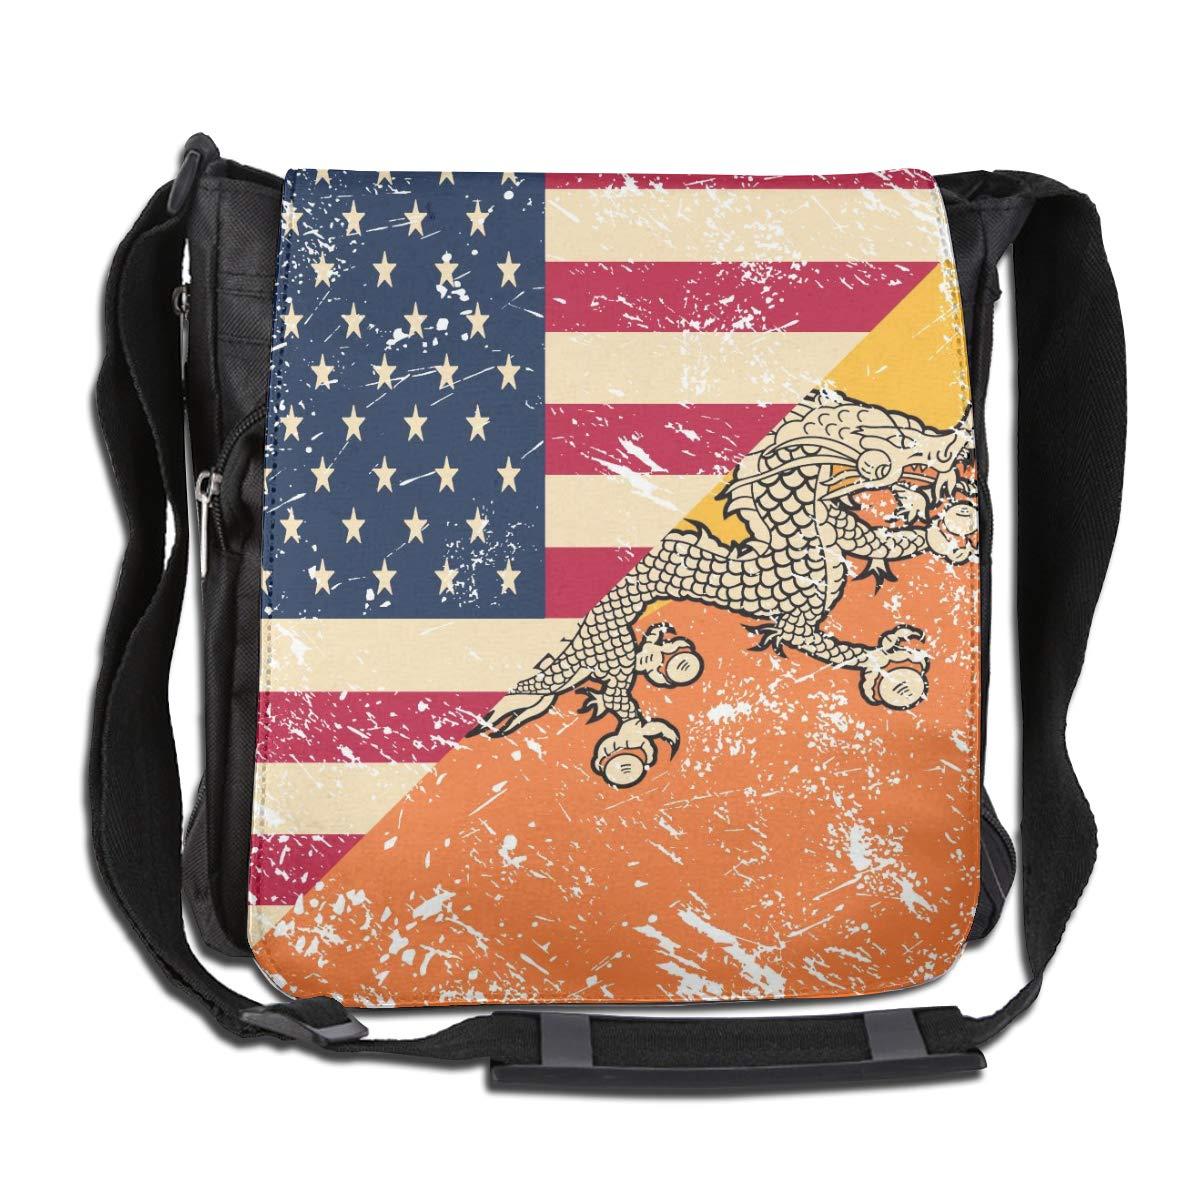 Unisex Fashion Satchel Messenger Bags American And Bhutan Retro Flag2 Crossbody Shoulder Bag Traveling Bag For School//Work//Trips